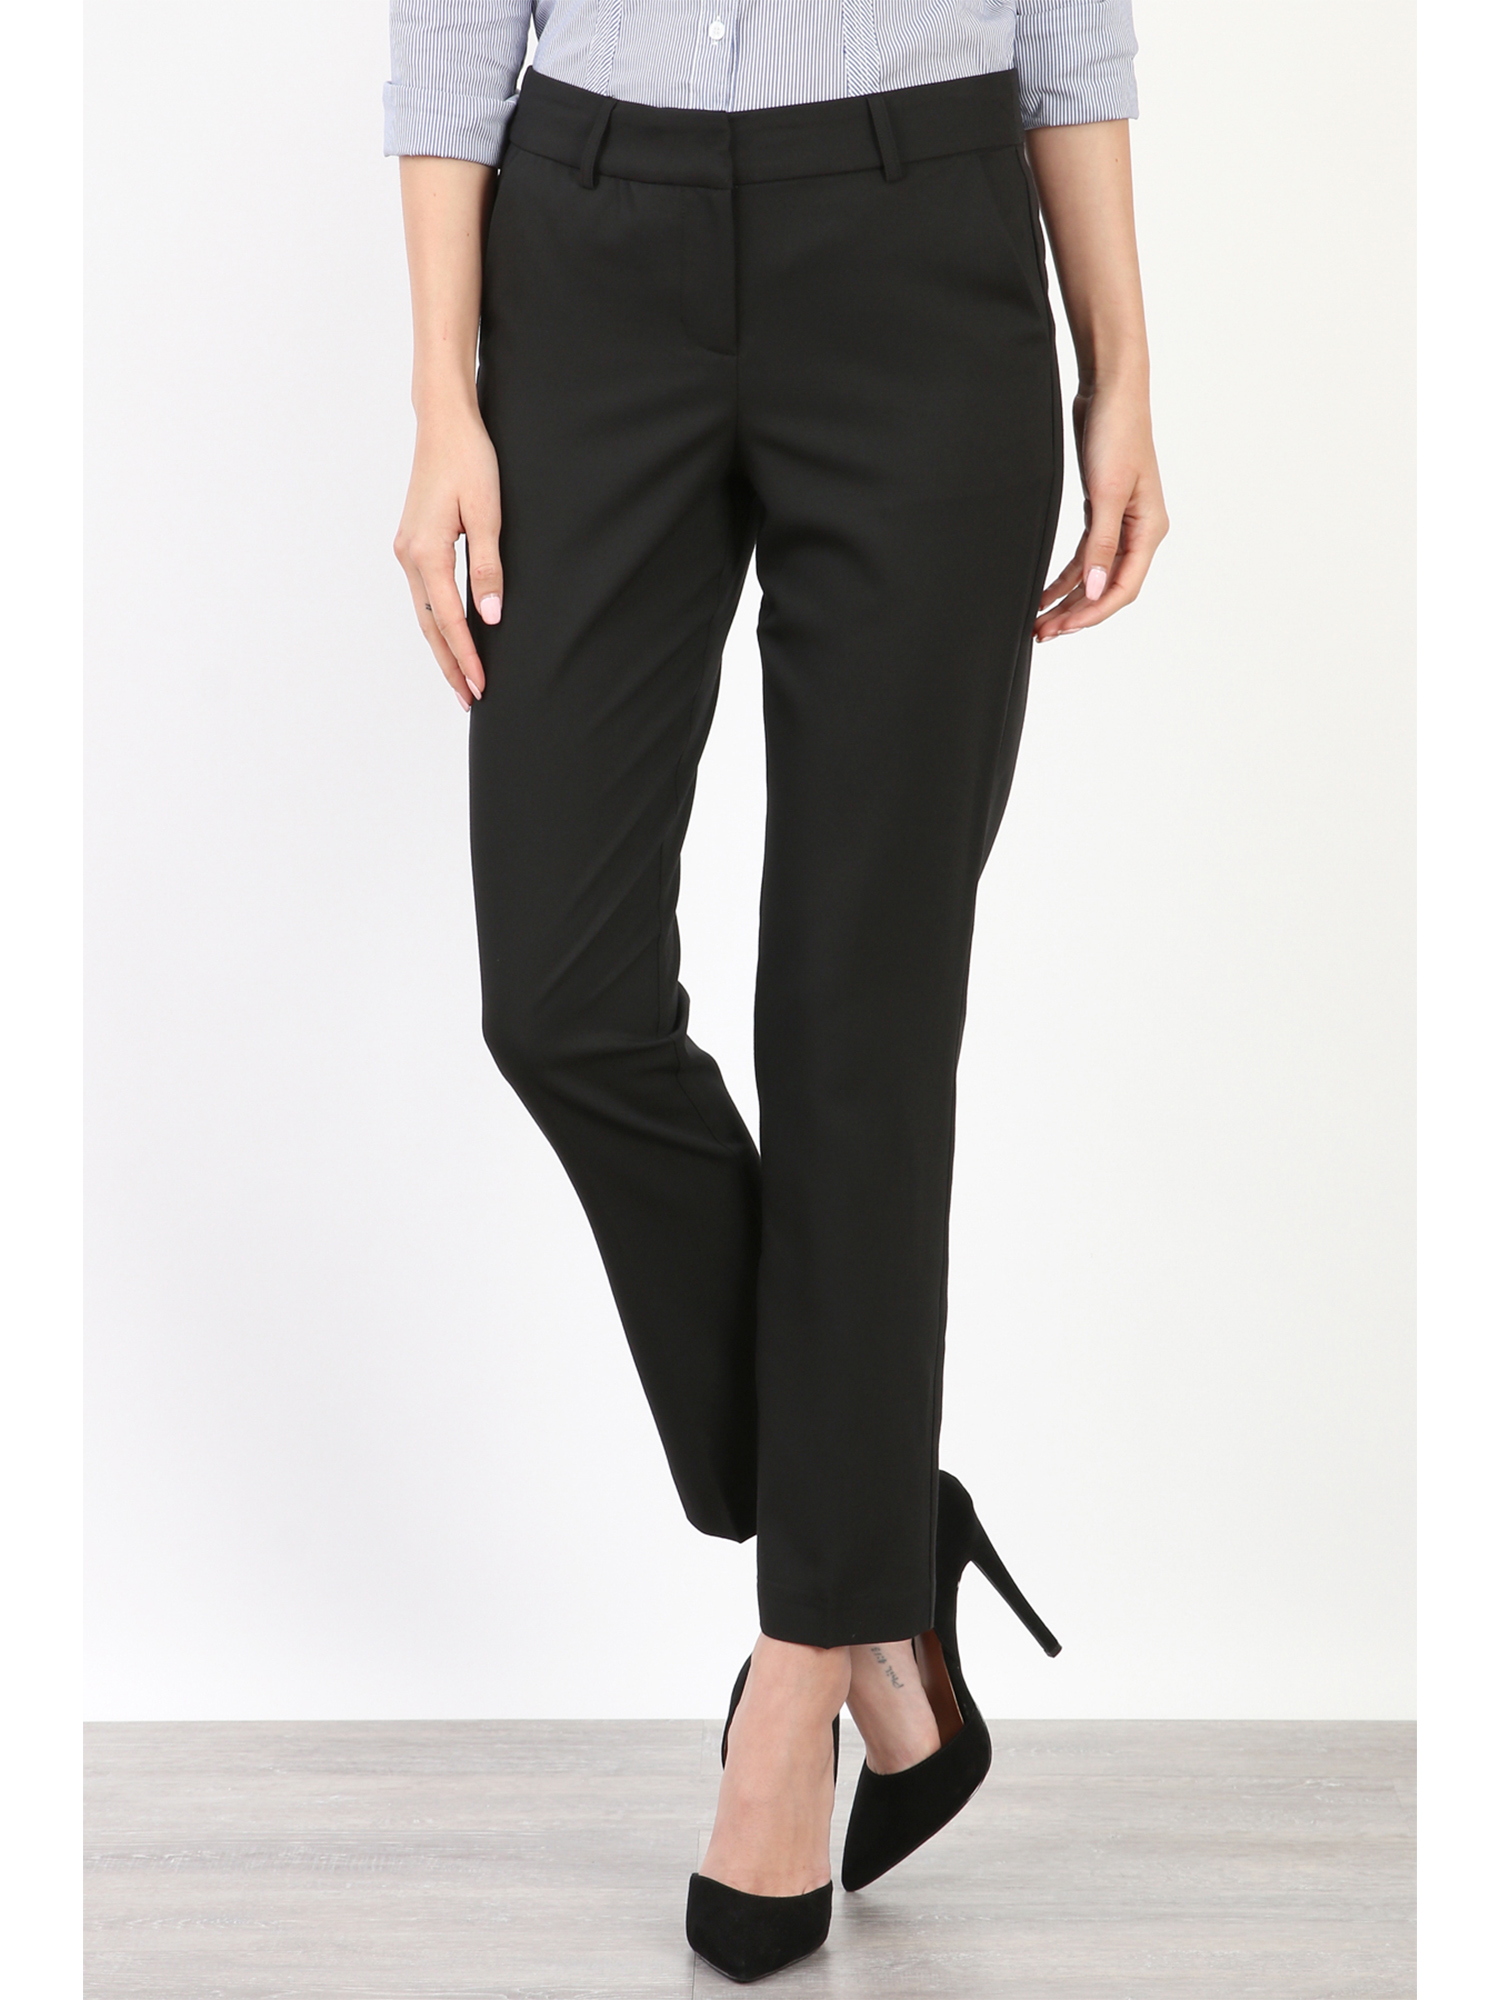 Maryclan Women's Cool Tropical Little But Cut Dress Pants